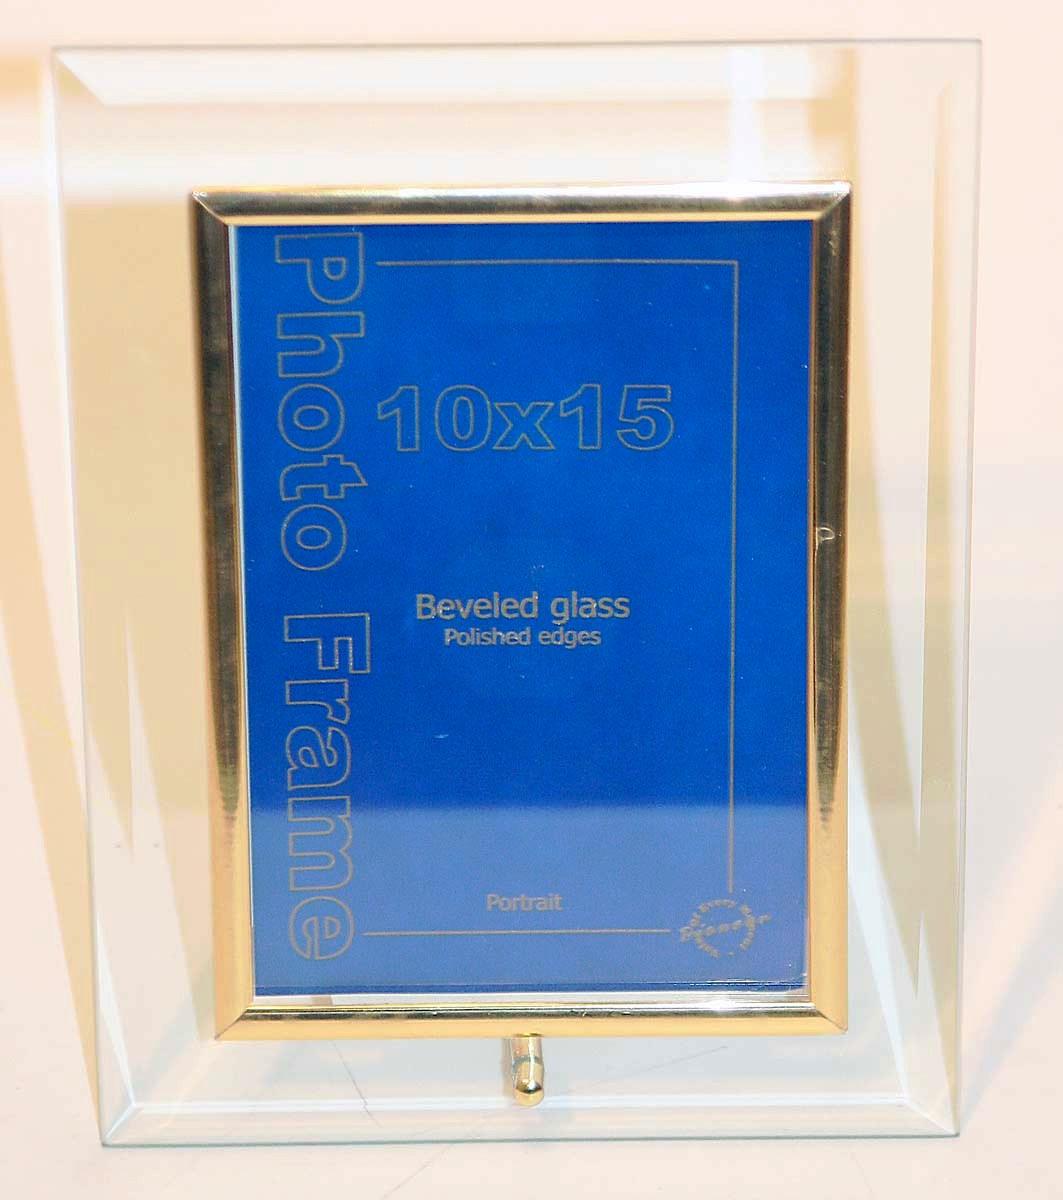 Фоторамка стеклянная Veld-Co, 10 х 15 см8065Фоторамка стеклянная Veld-Co, 10 х 15 см